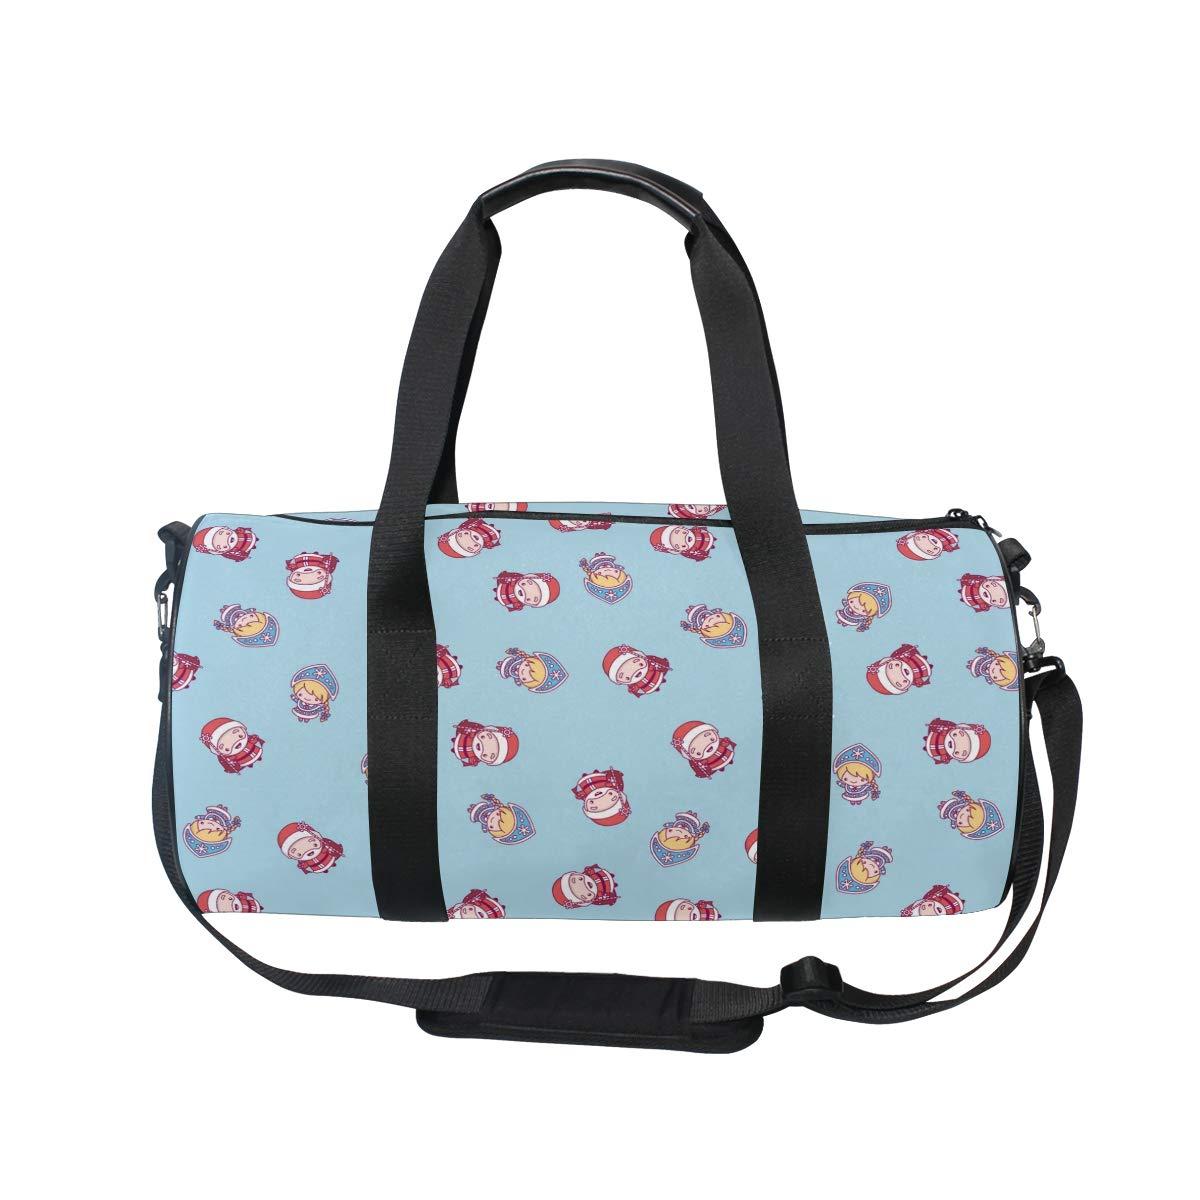 Santa Claus Christmas Popular casual fitness bag,Non-Slip Wearable Crossbody Bag Waterproof Shoulder Bag.